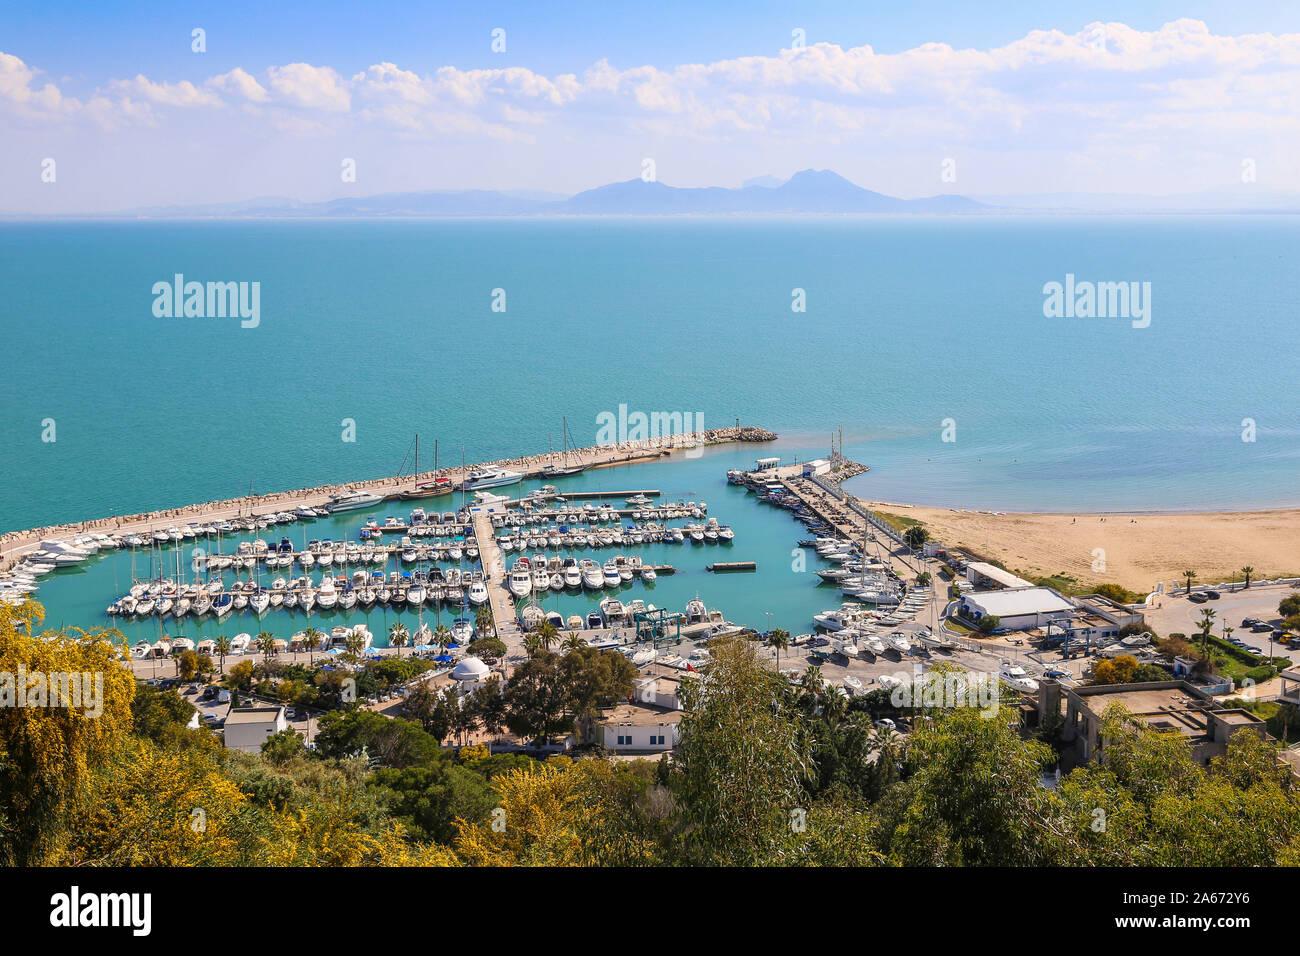 La Tunisie, Sidi Bou Saïd, vue de Sidi Bou Said marina Banque D'Images